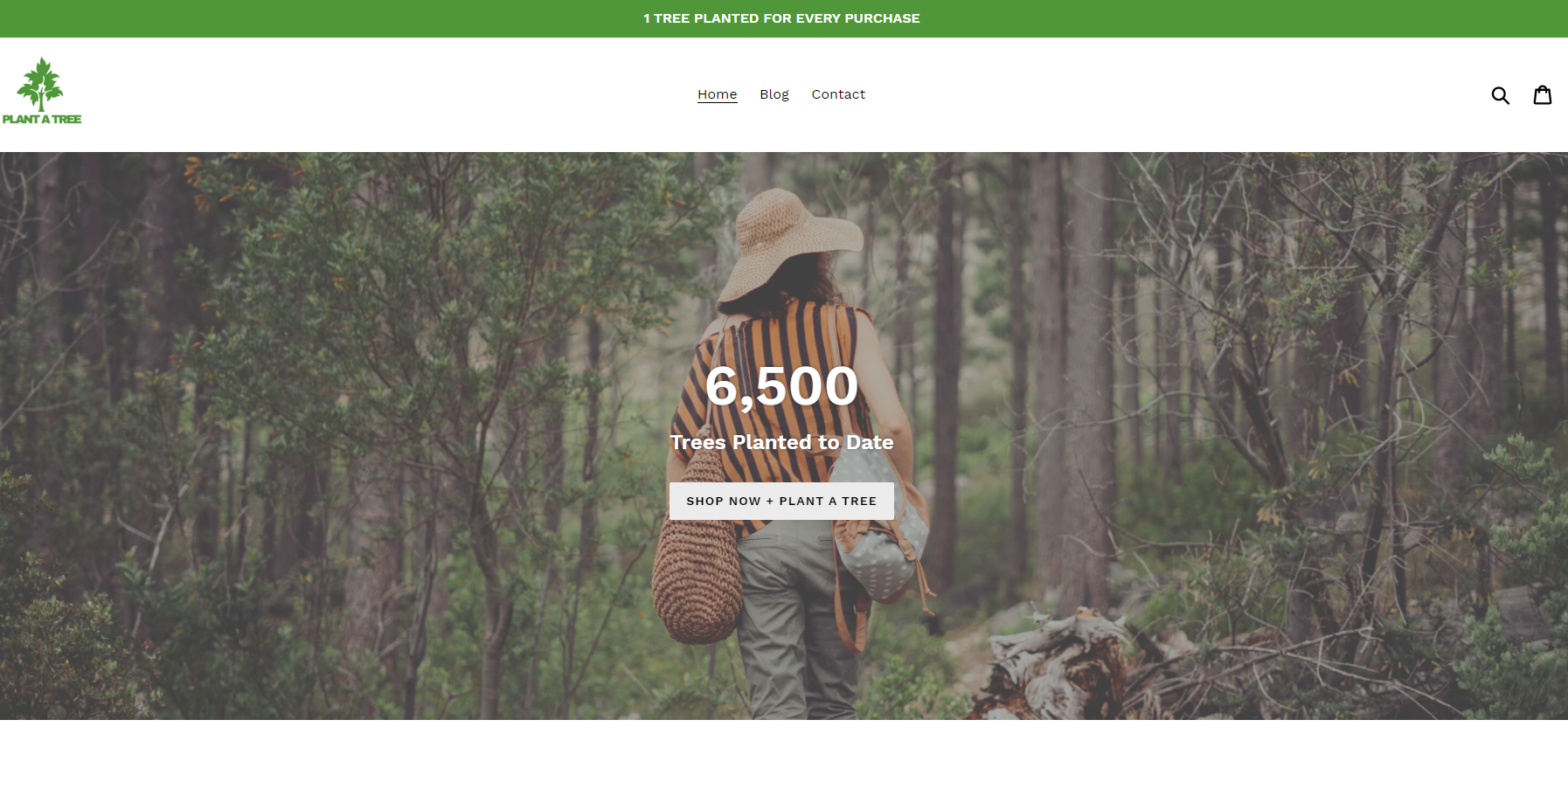 plant a tree co plantatreeco scam home page